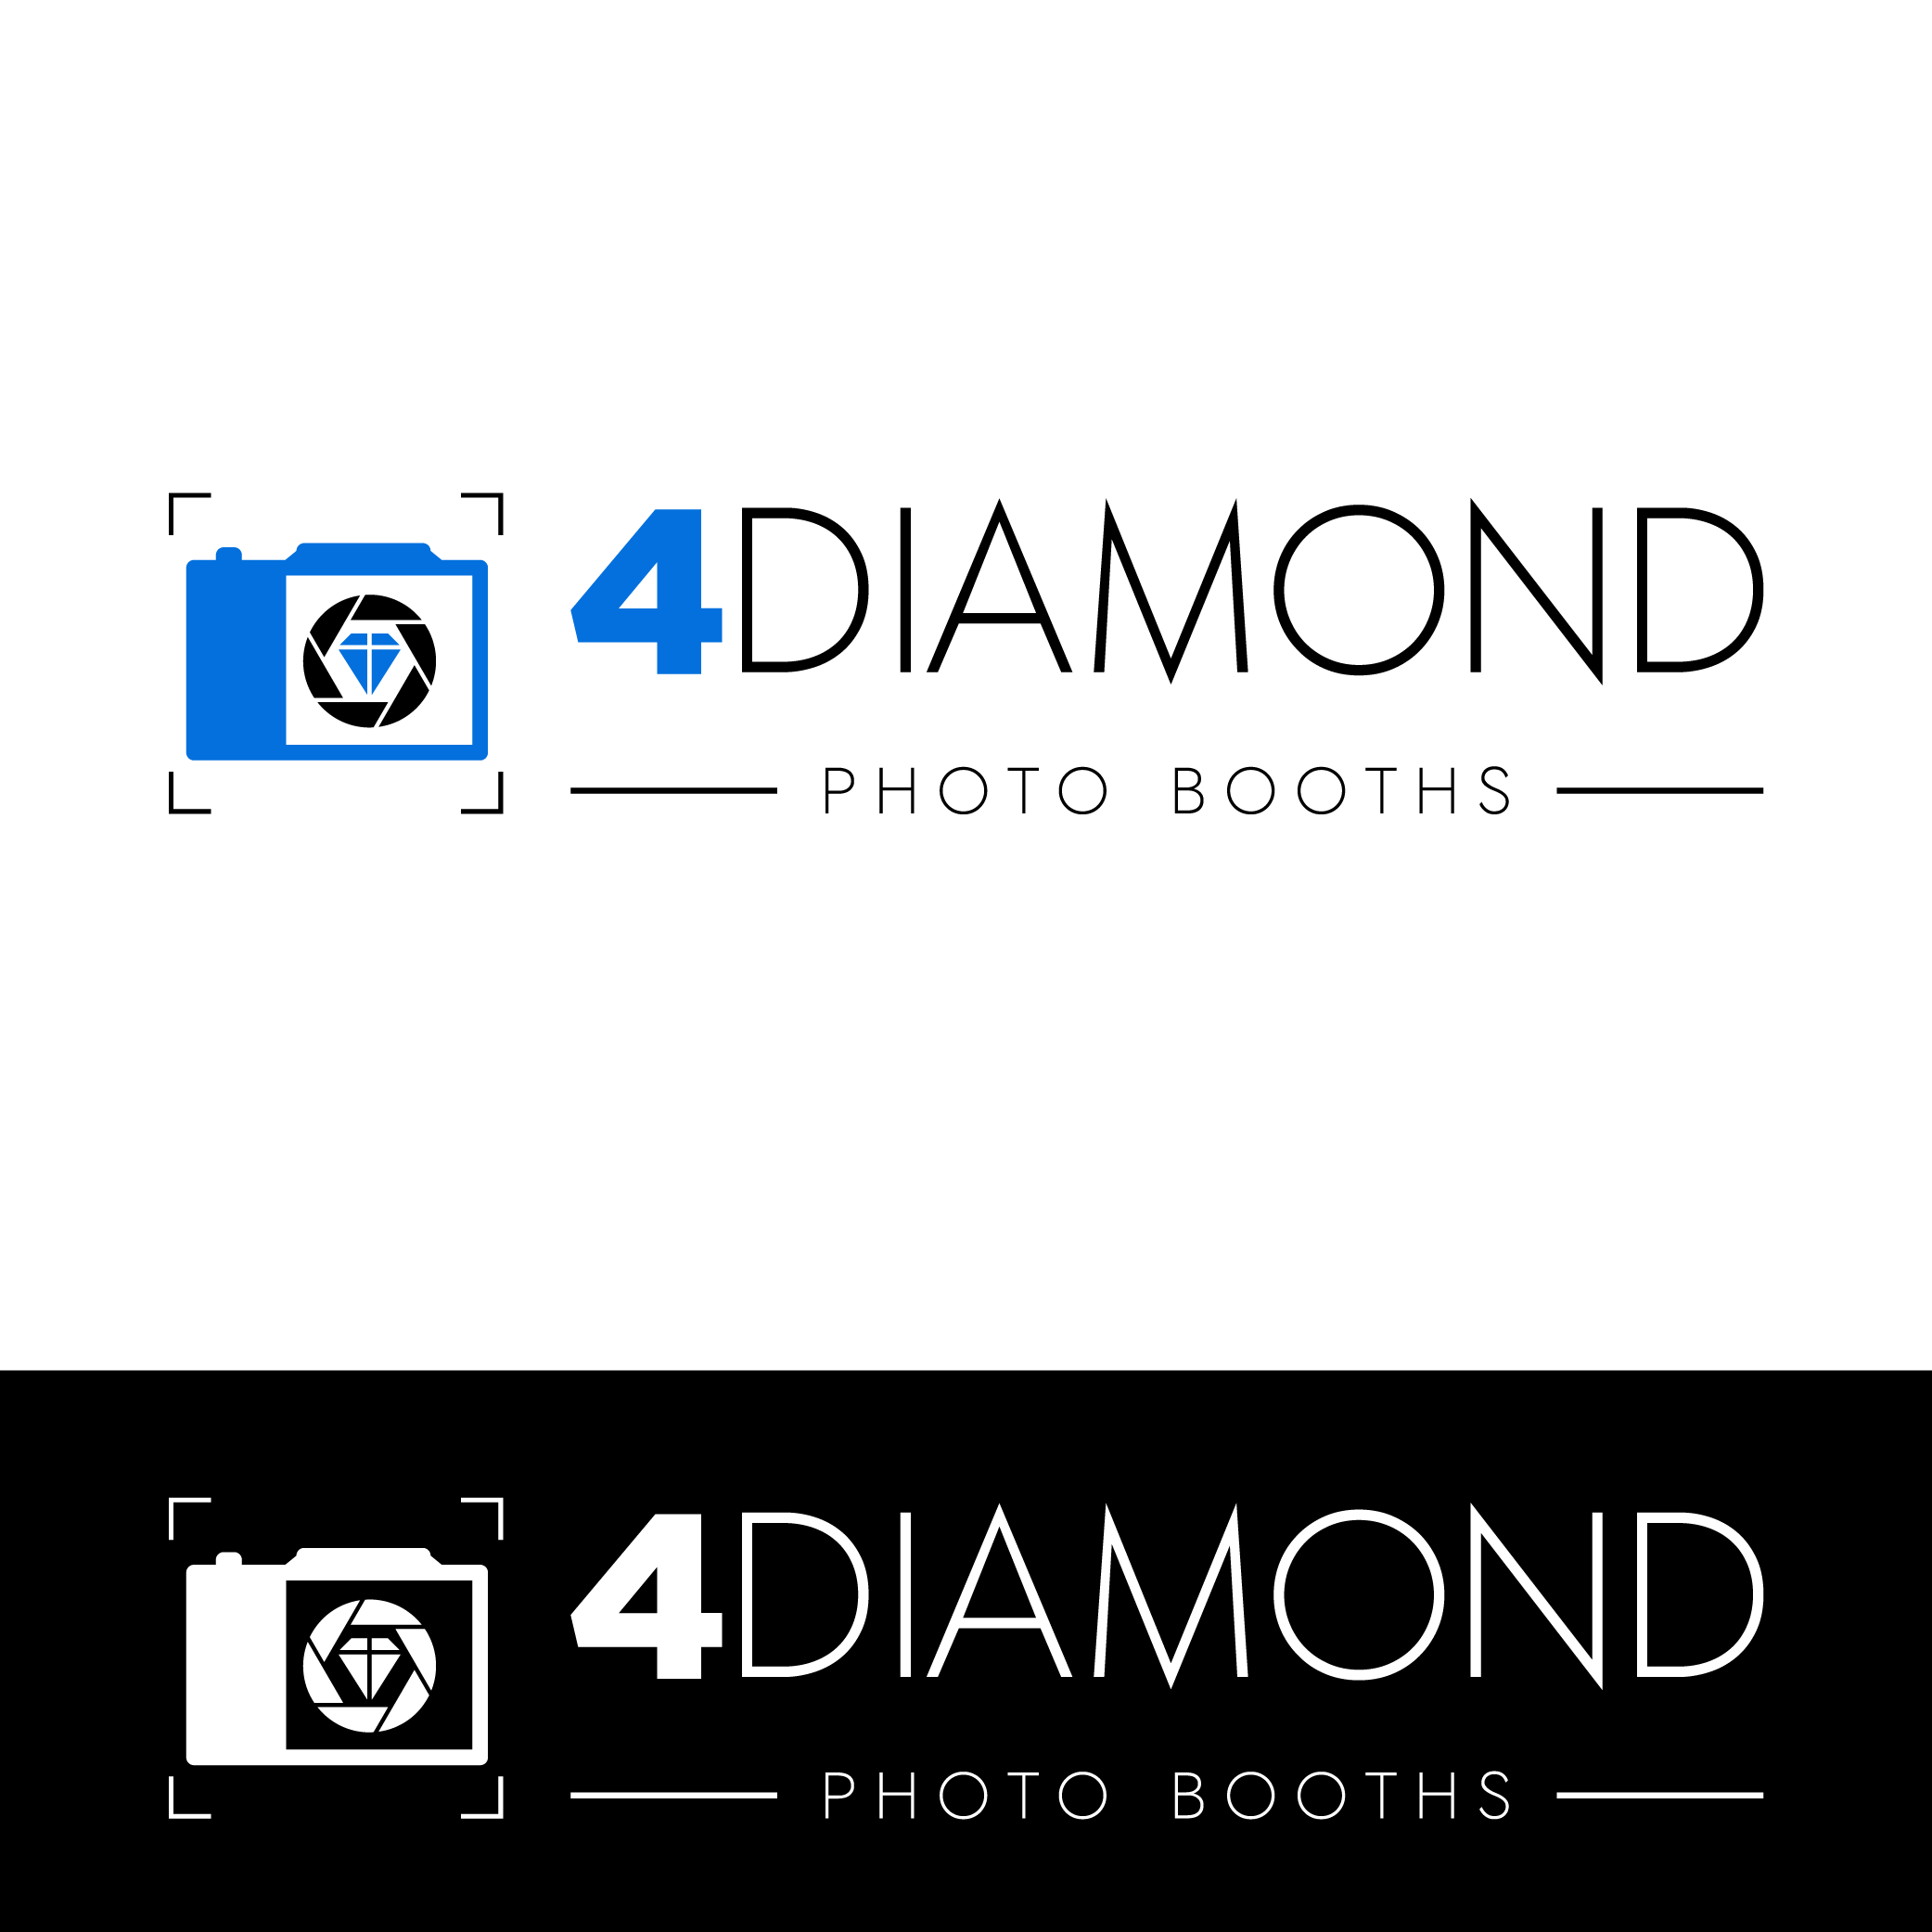 Logo Design by Private User - Entry No. 6 in the Logo Design Contest Creative Logo Design for 4 Diamond Photo Booths.